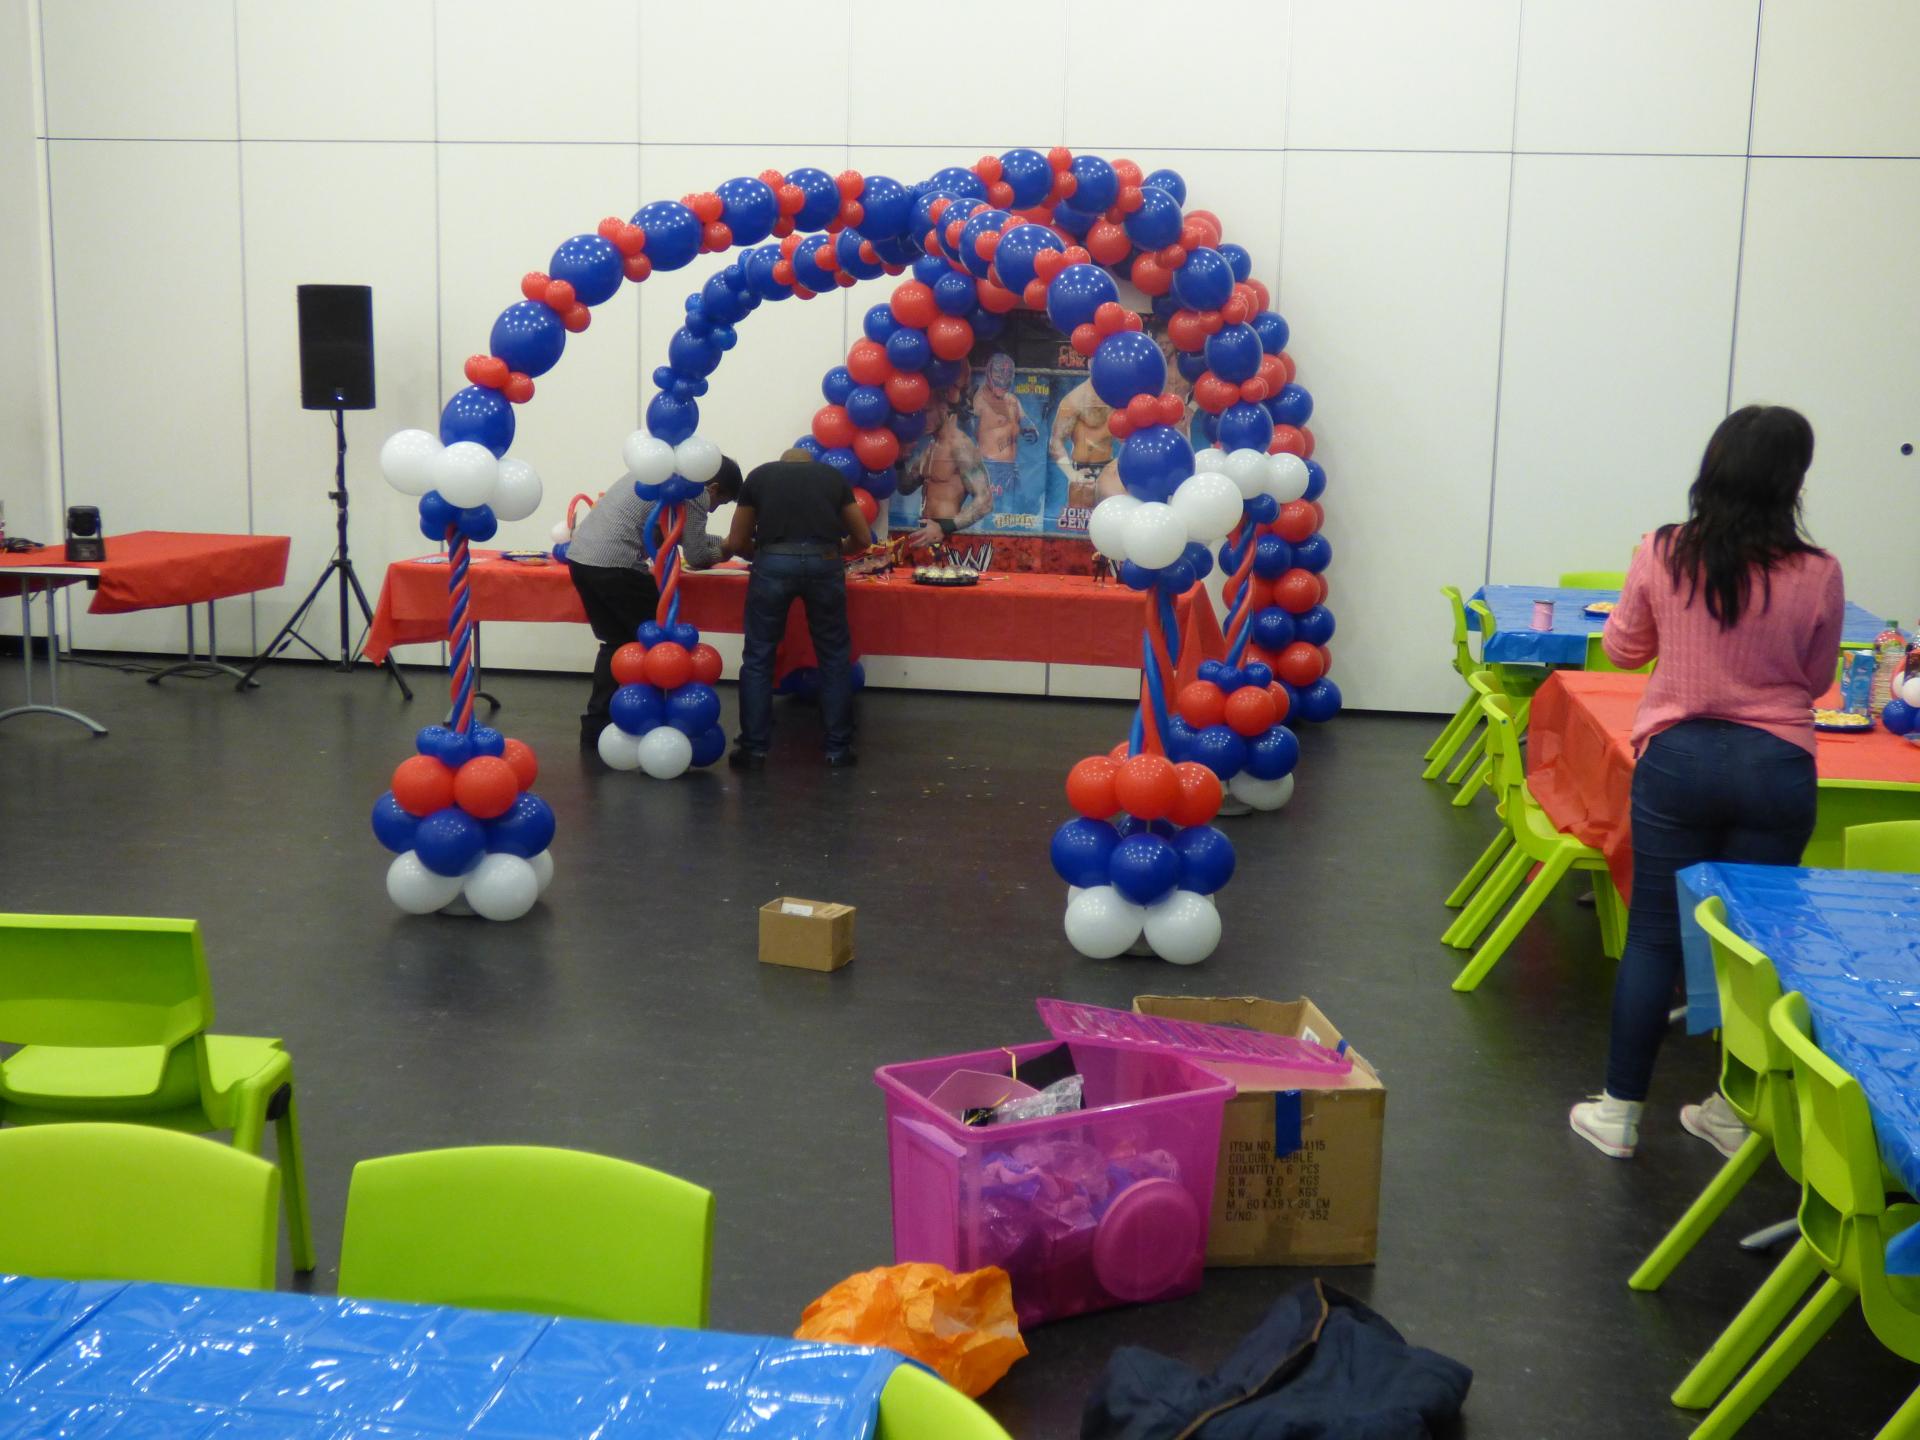 WWE Balloon canopy